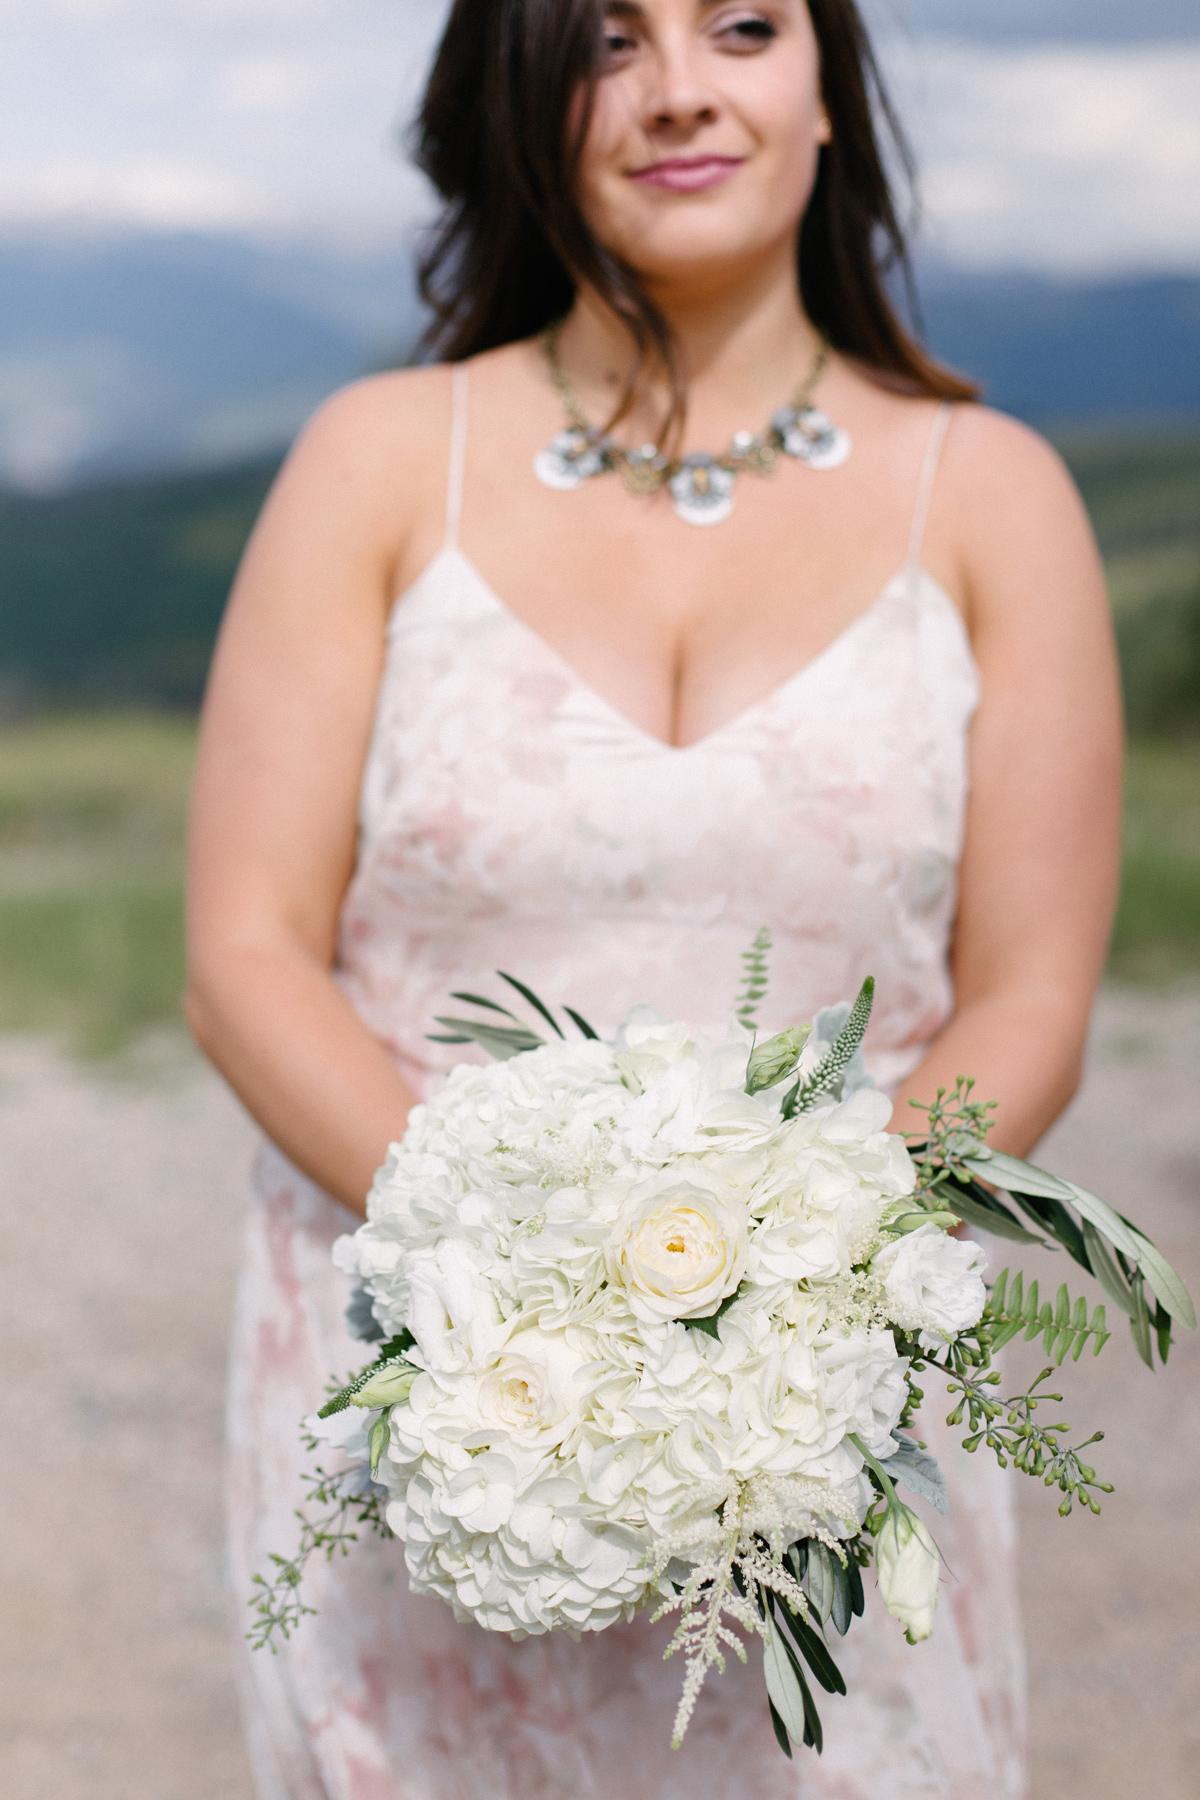 338-beaver-creek--bouquet--bridesmaid--white-flowers.jpg